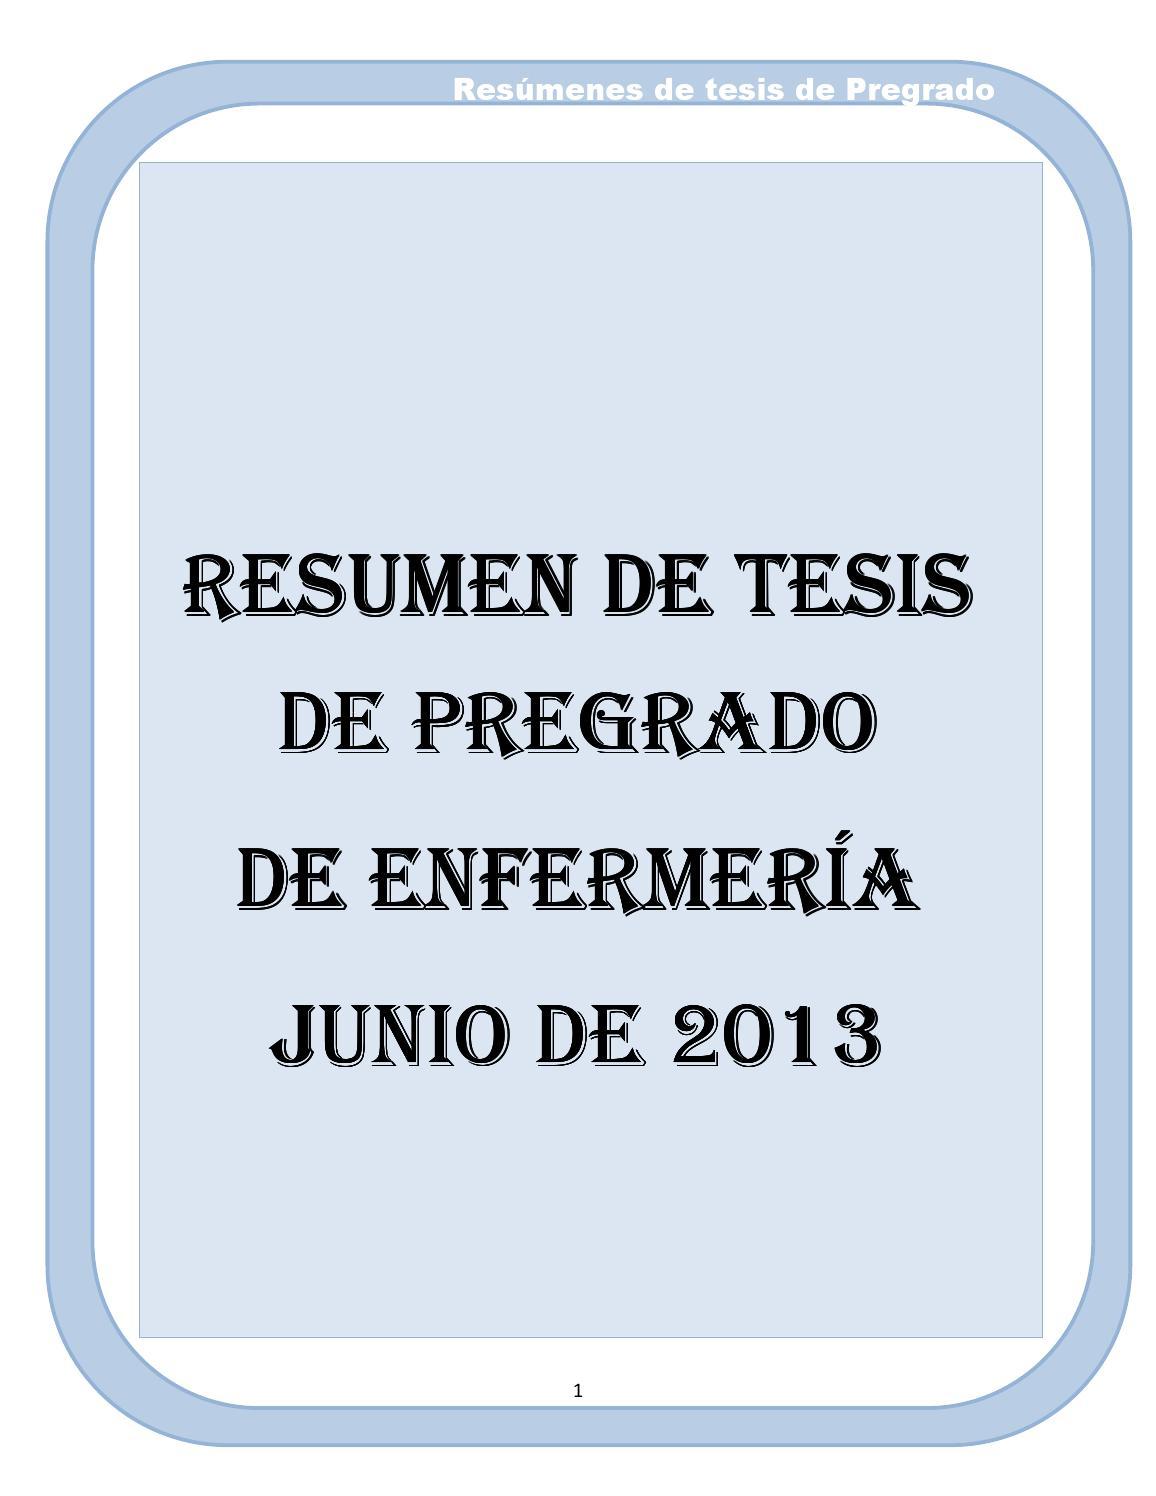 Resumenes de tesis de enfermeria 2005 2010 by john unheval - issuu